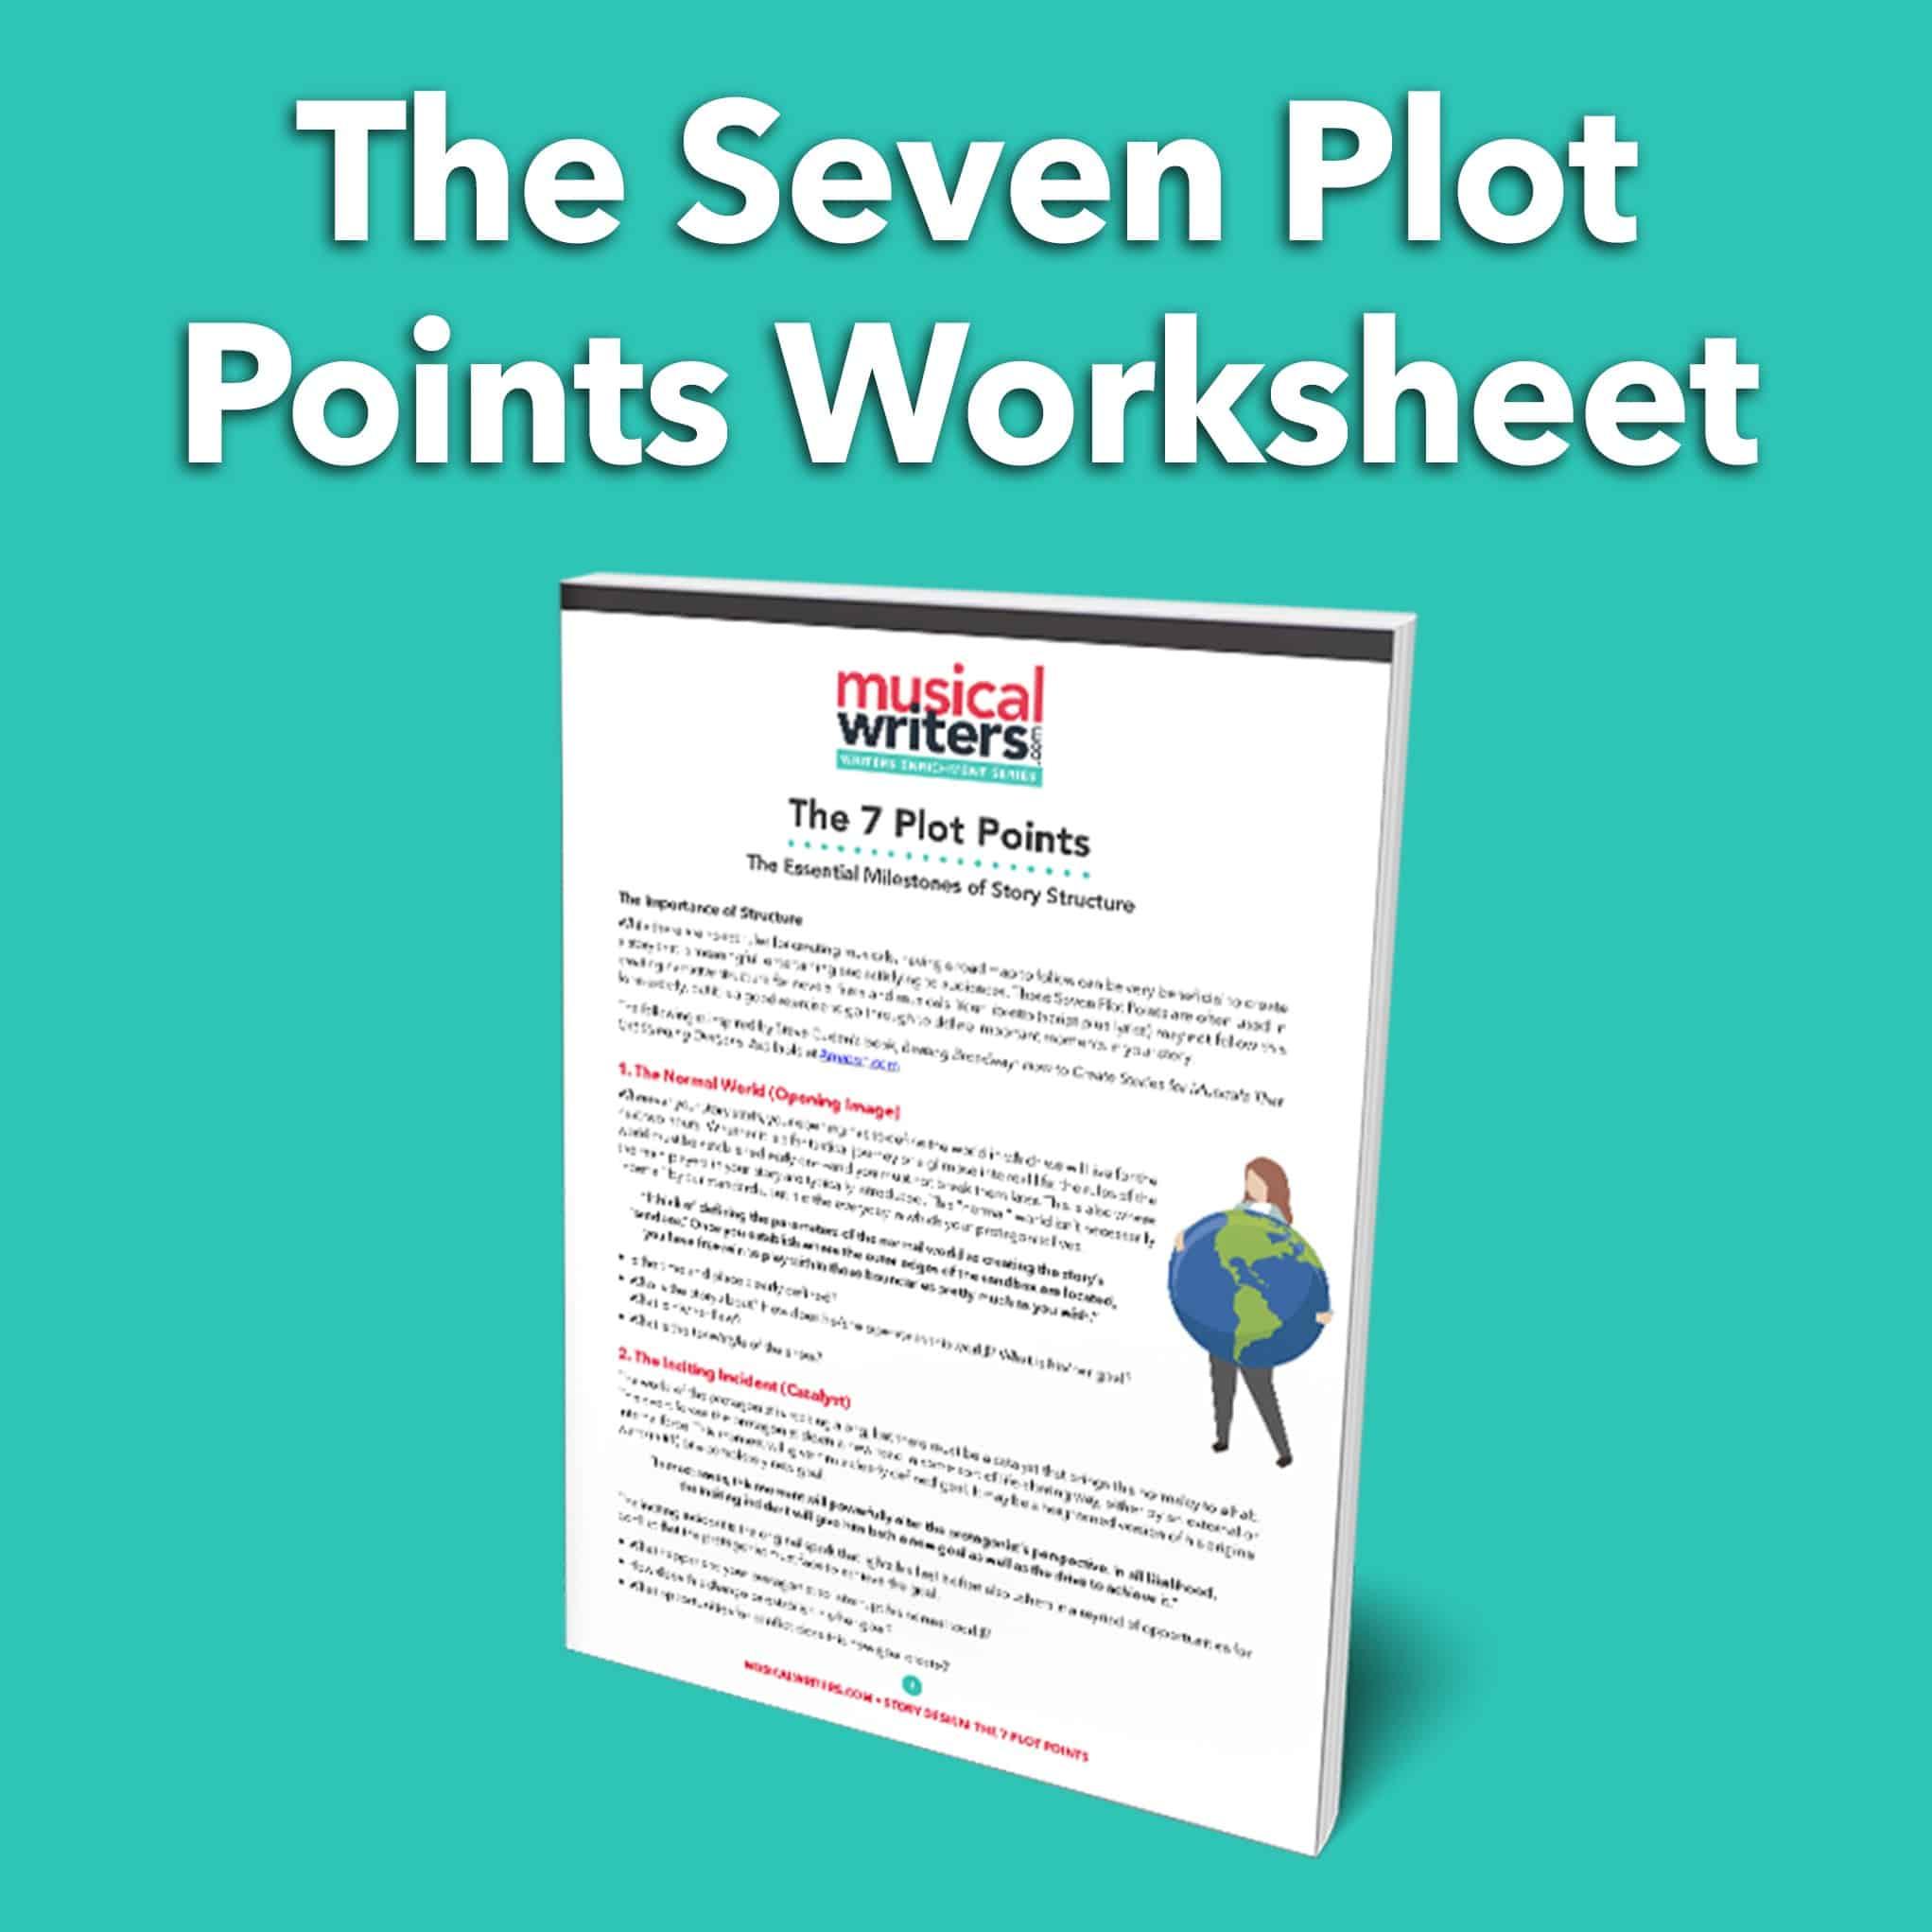 The Seven Plot Points Story Worksheet